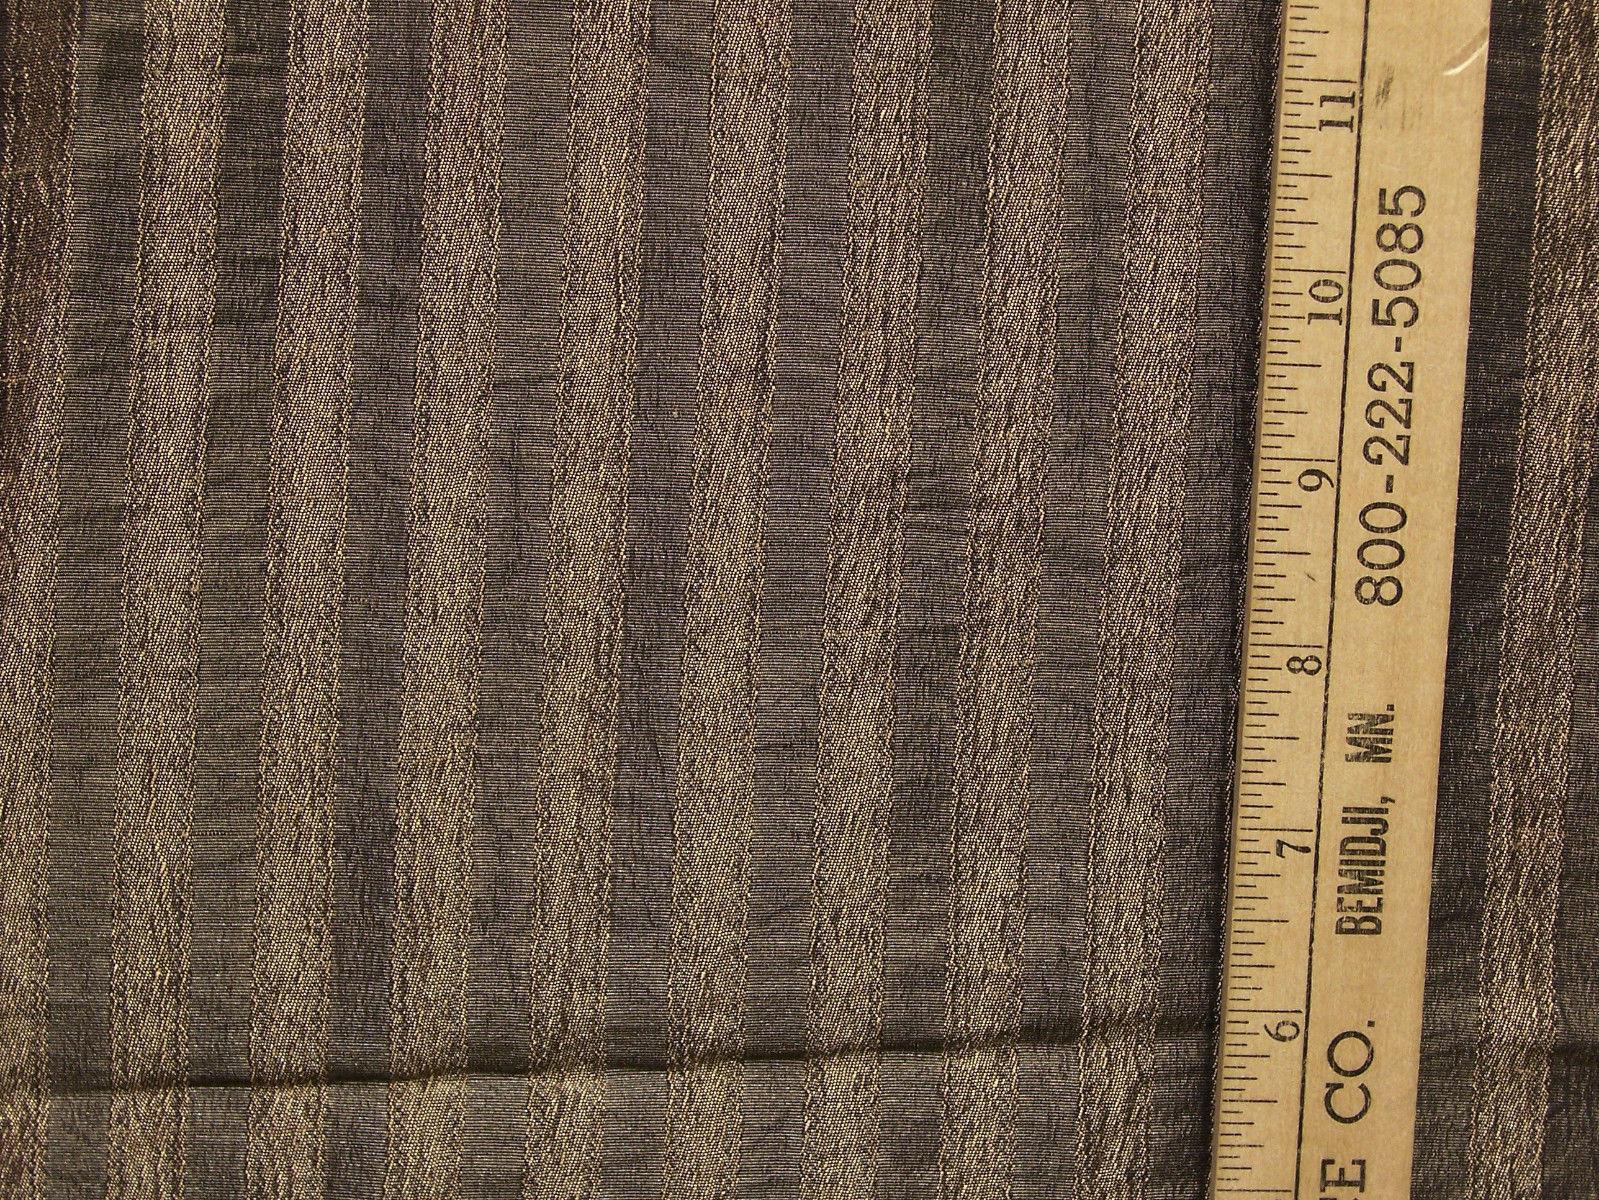 Shimmering Stripe Striped Fabric Metallic Gray Gold Charcoal w/ Tassel Trim